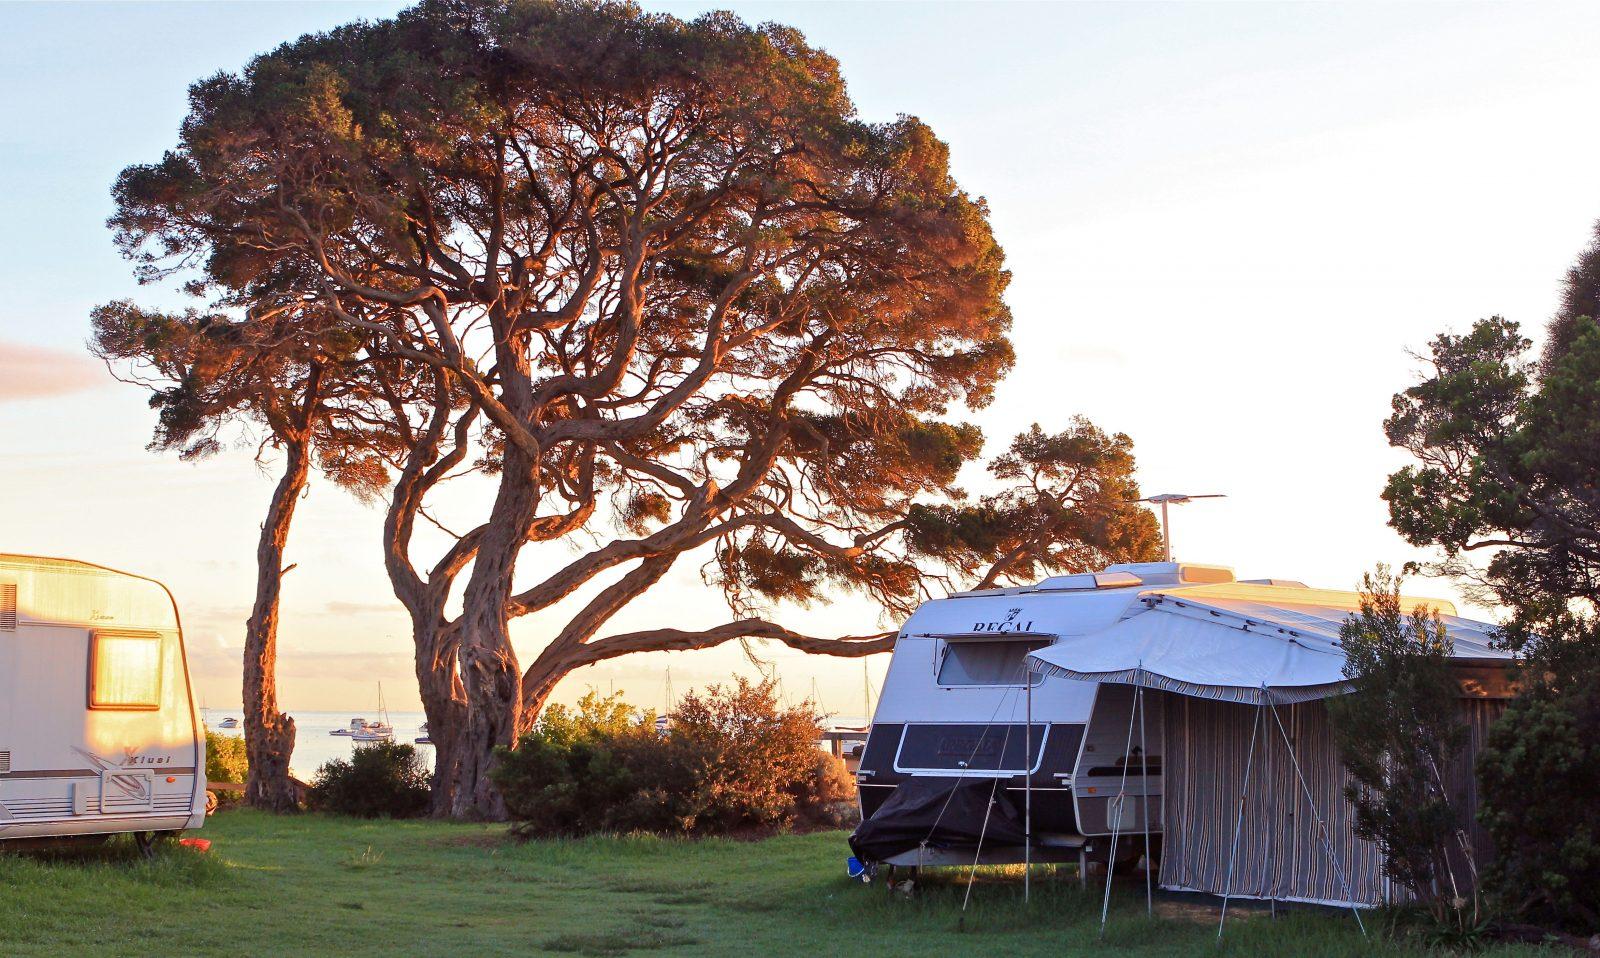 Camerons Bight Camping